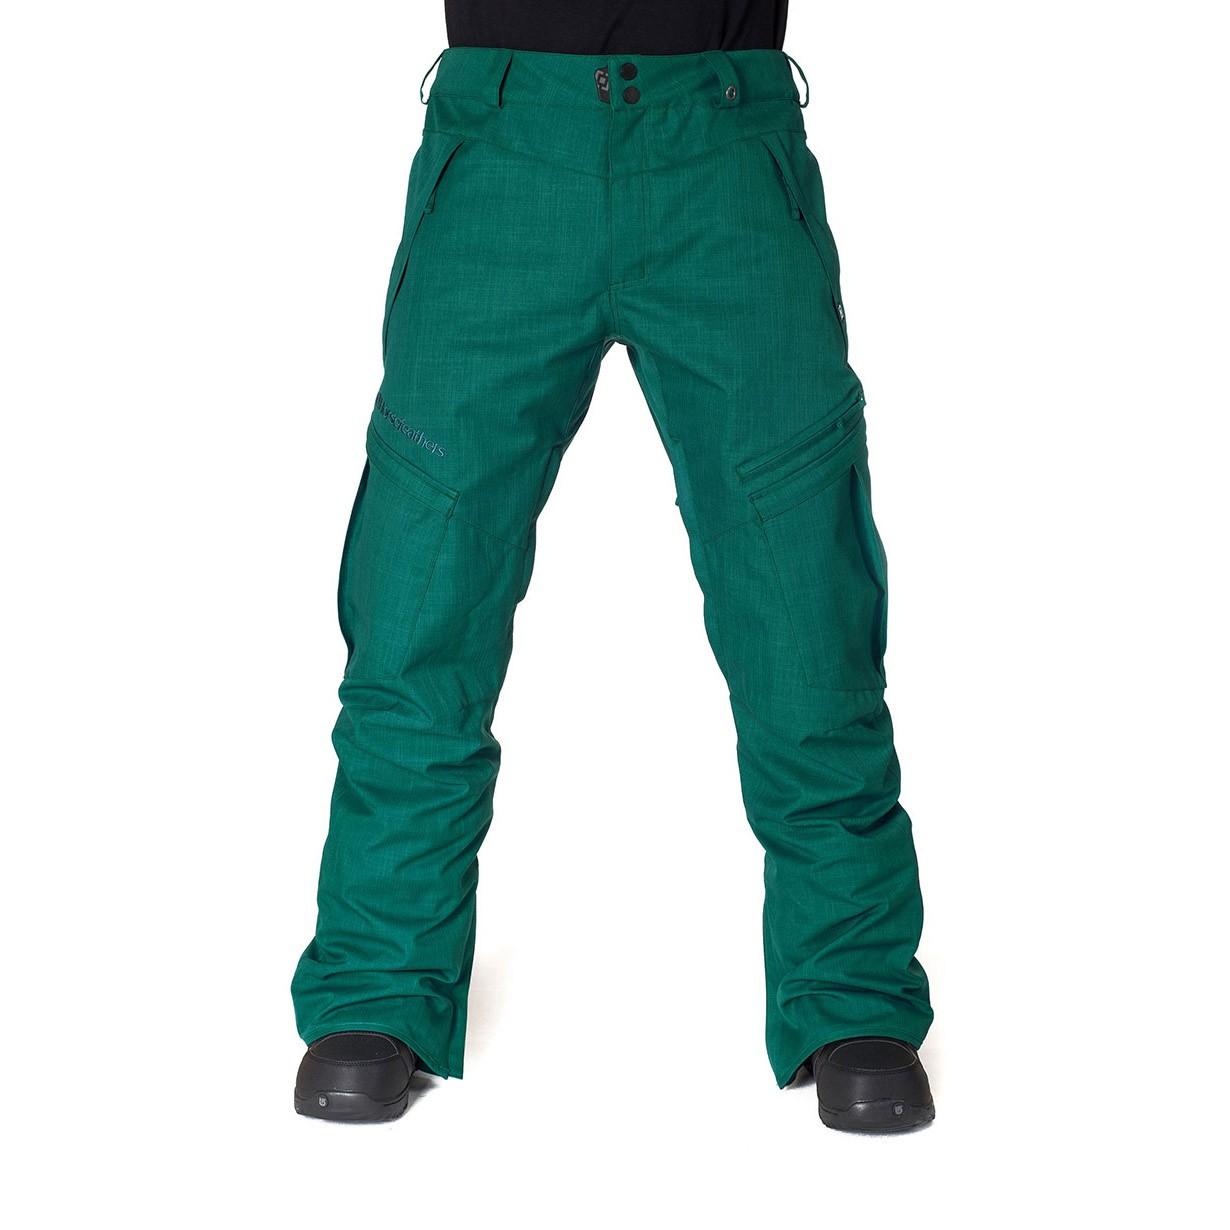 Kalhoty Horsefeathers Motive deep green